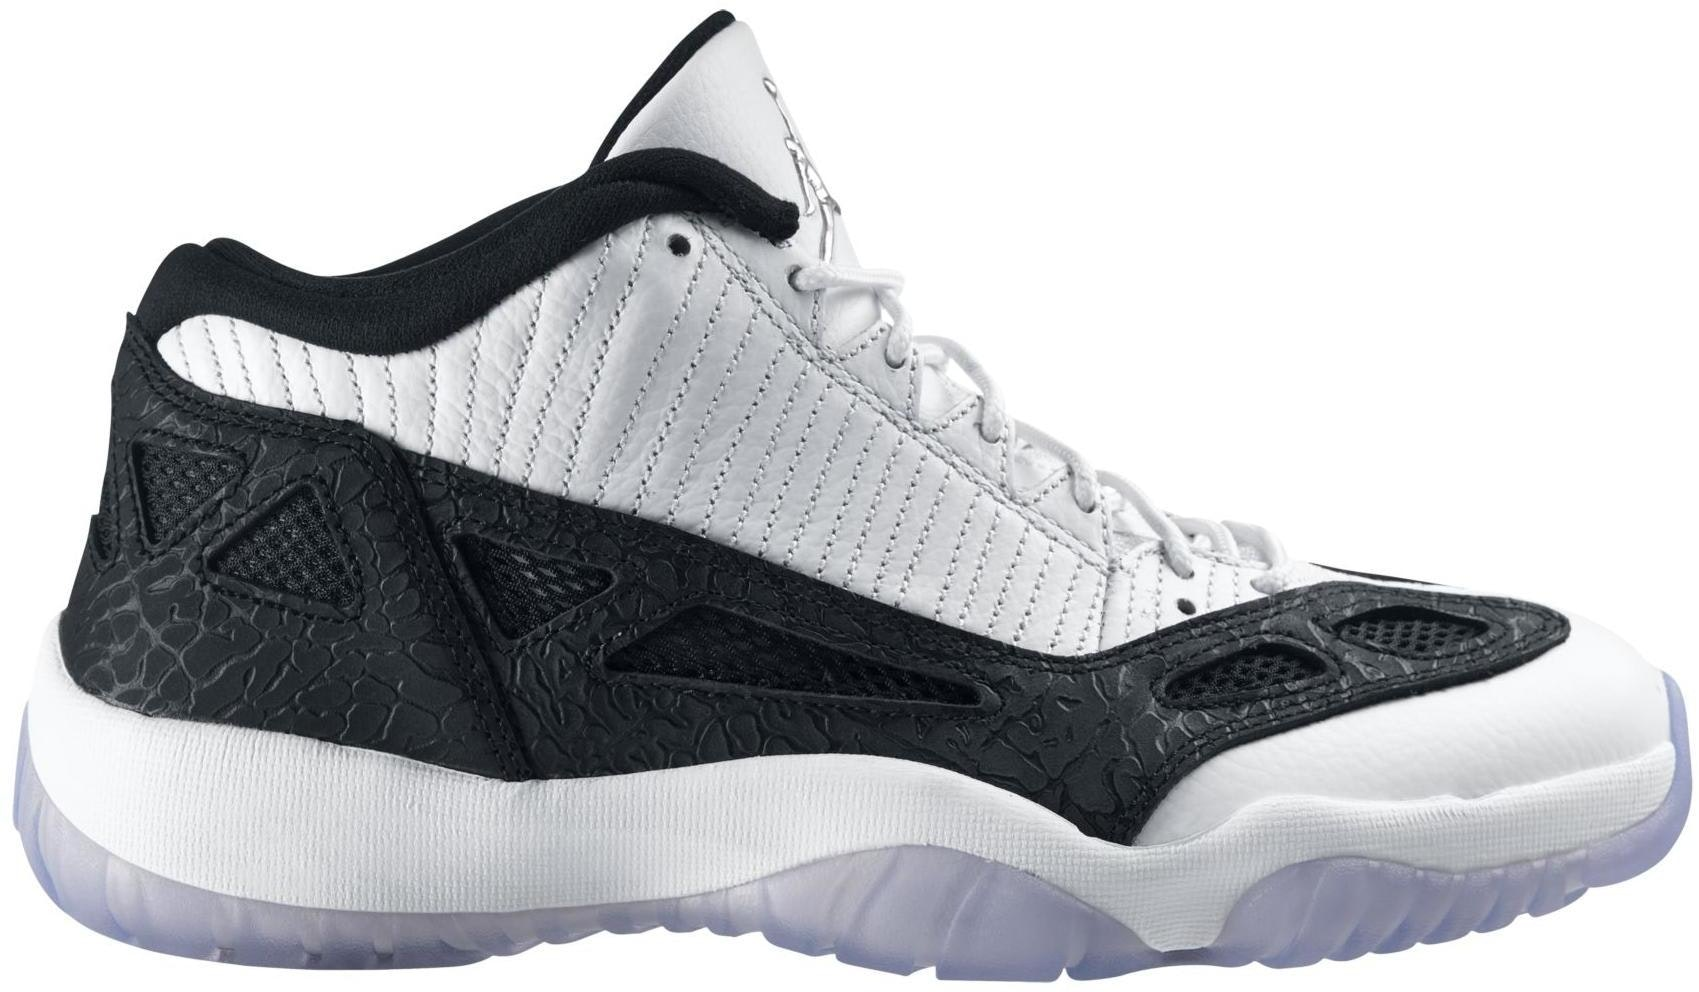 timeless design dc95e 56696 2011 Nike Air Jordan Xi Ie Bred